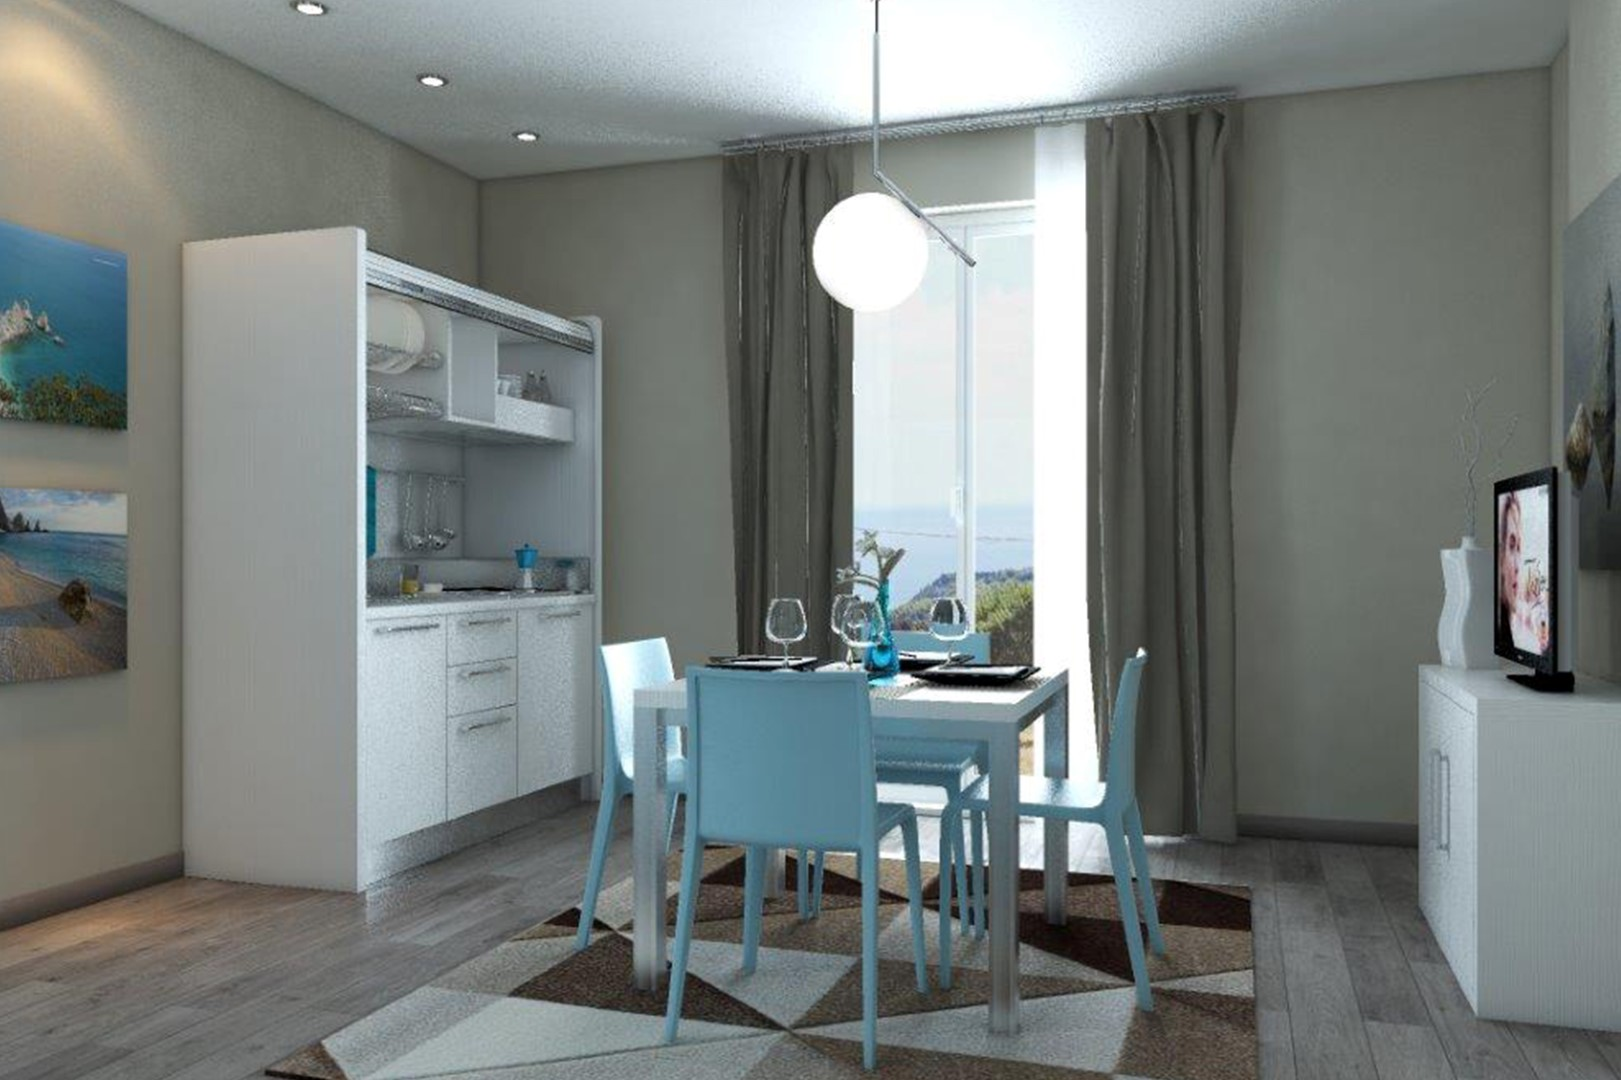 furniture_0002_1.hotel-villas-apartments_furniture (1)